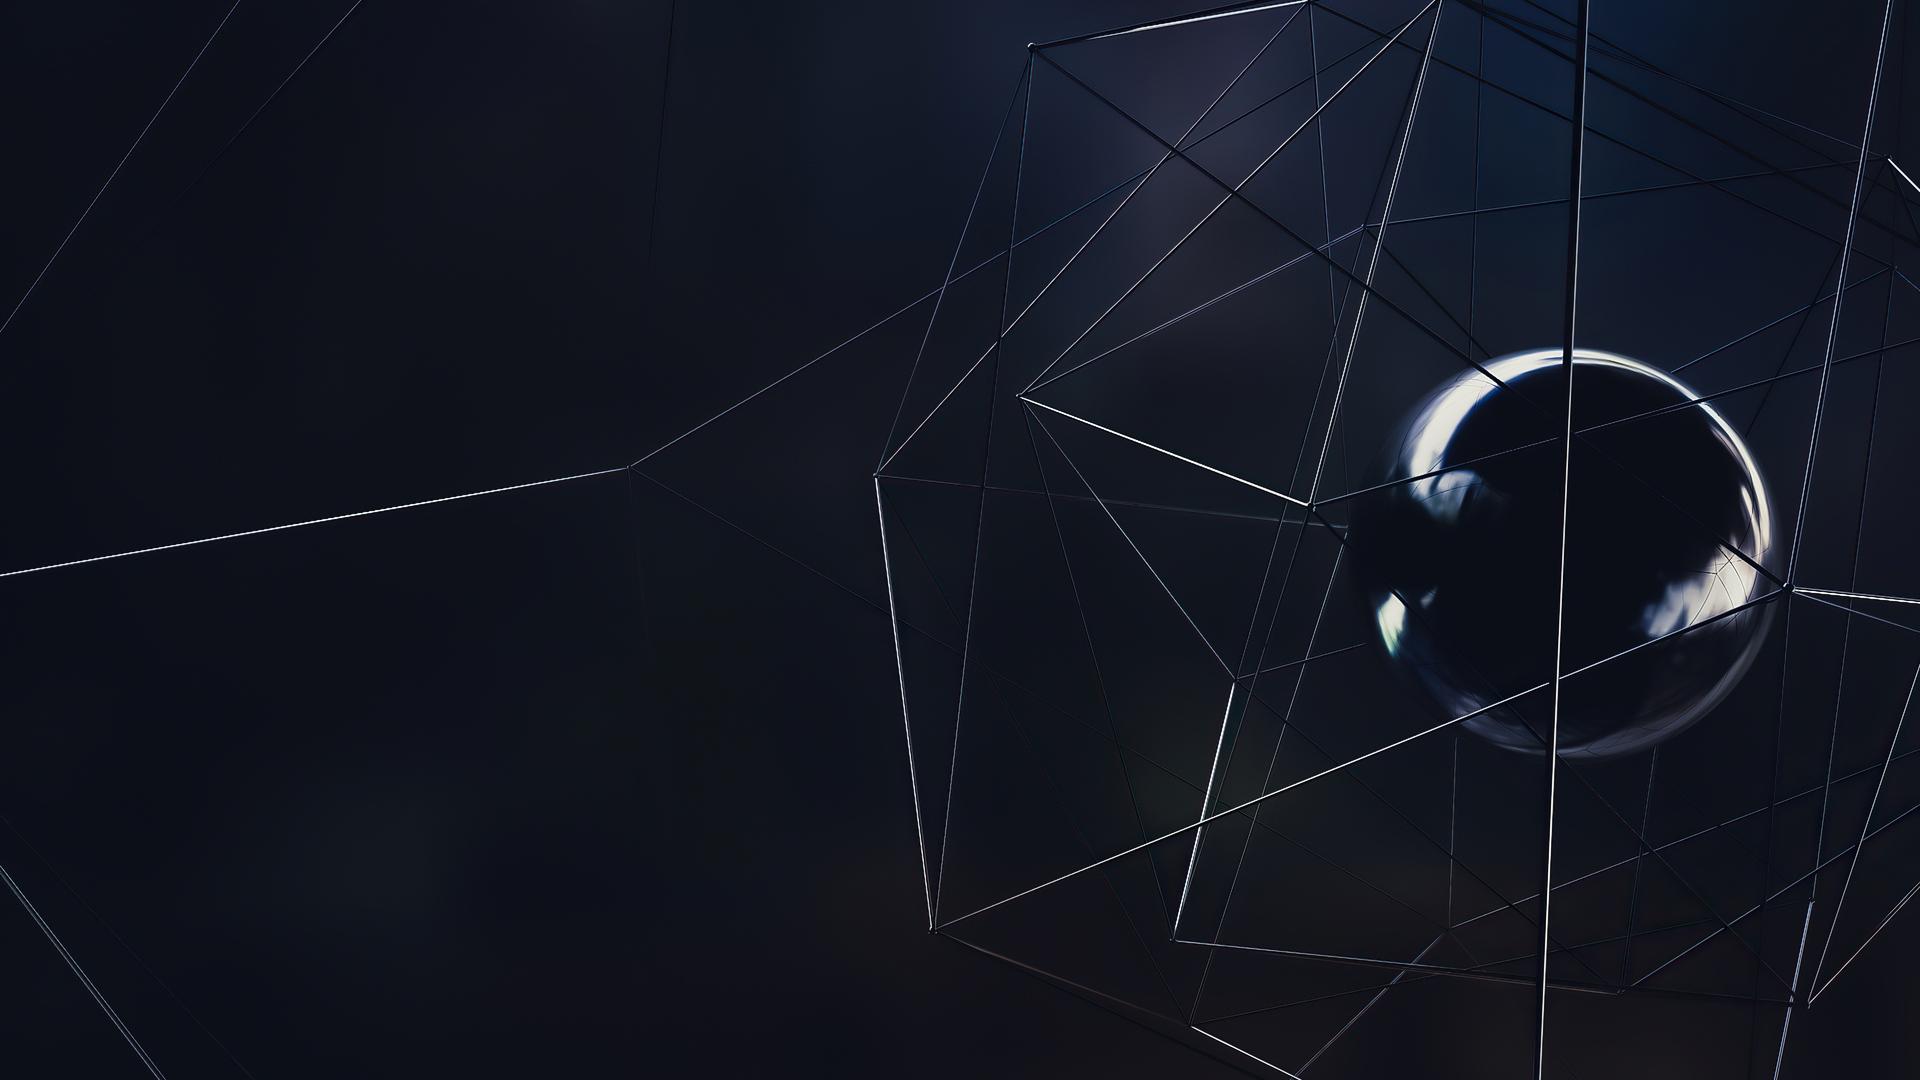 3d-graphic-ball-4k-y0.jpg